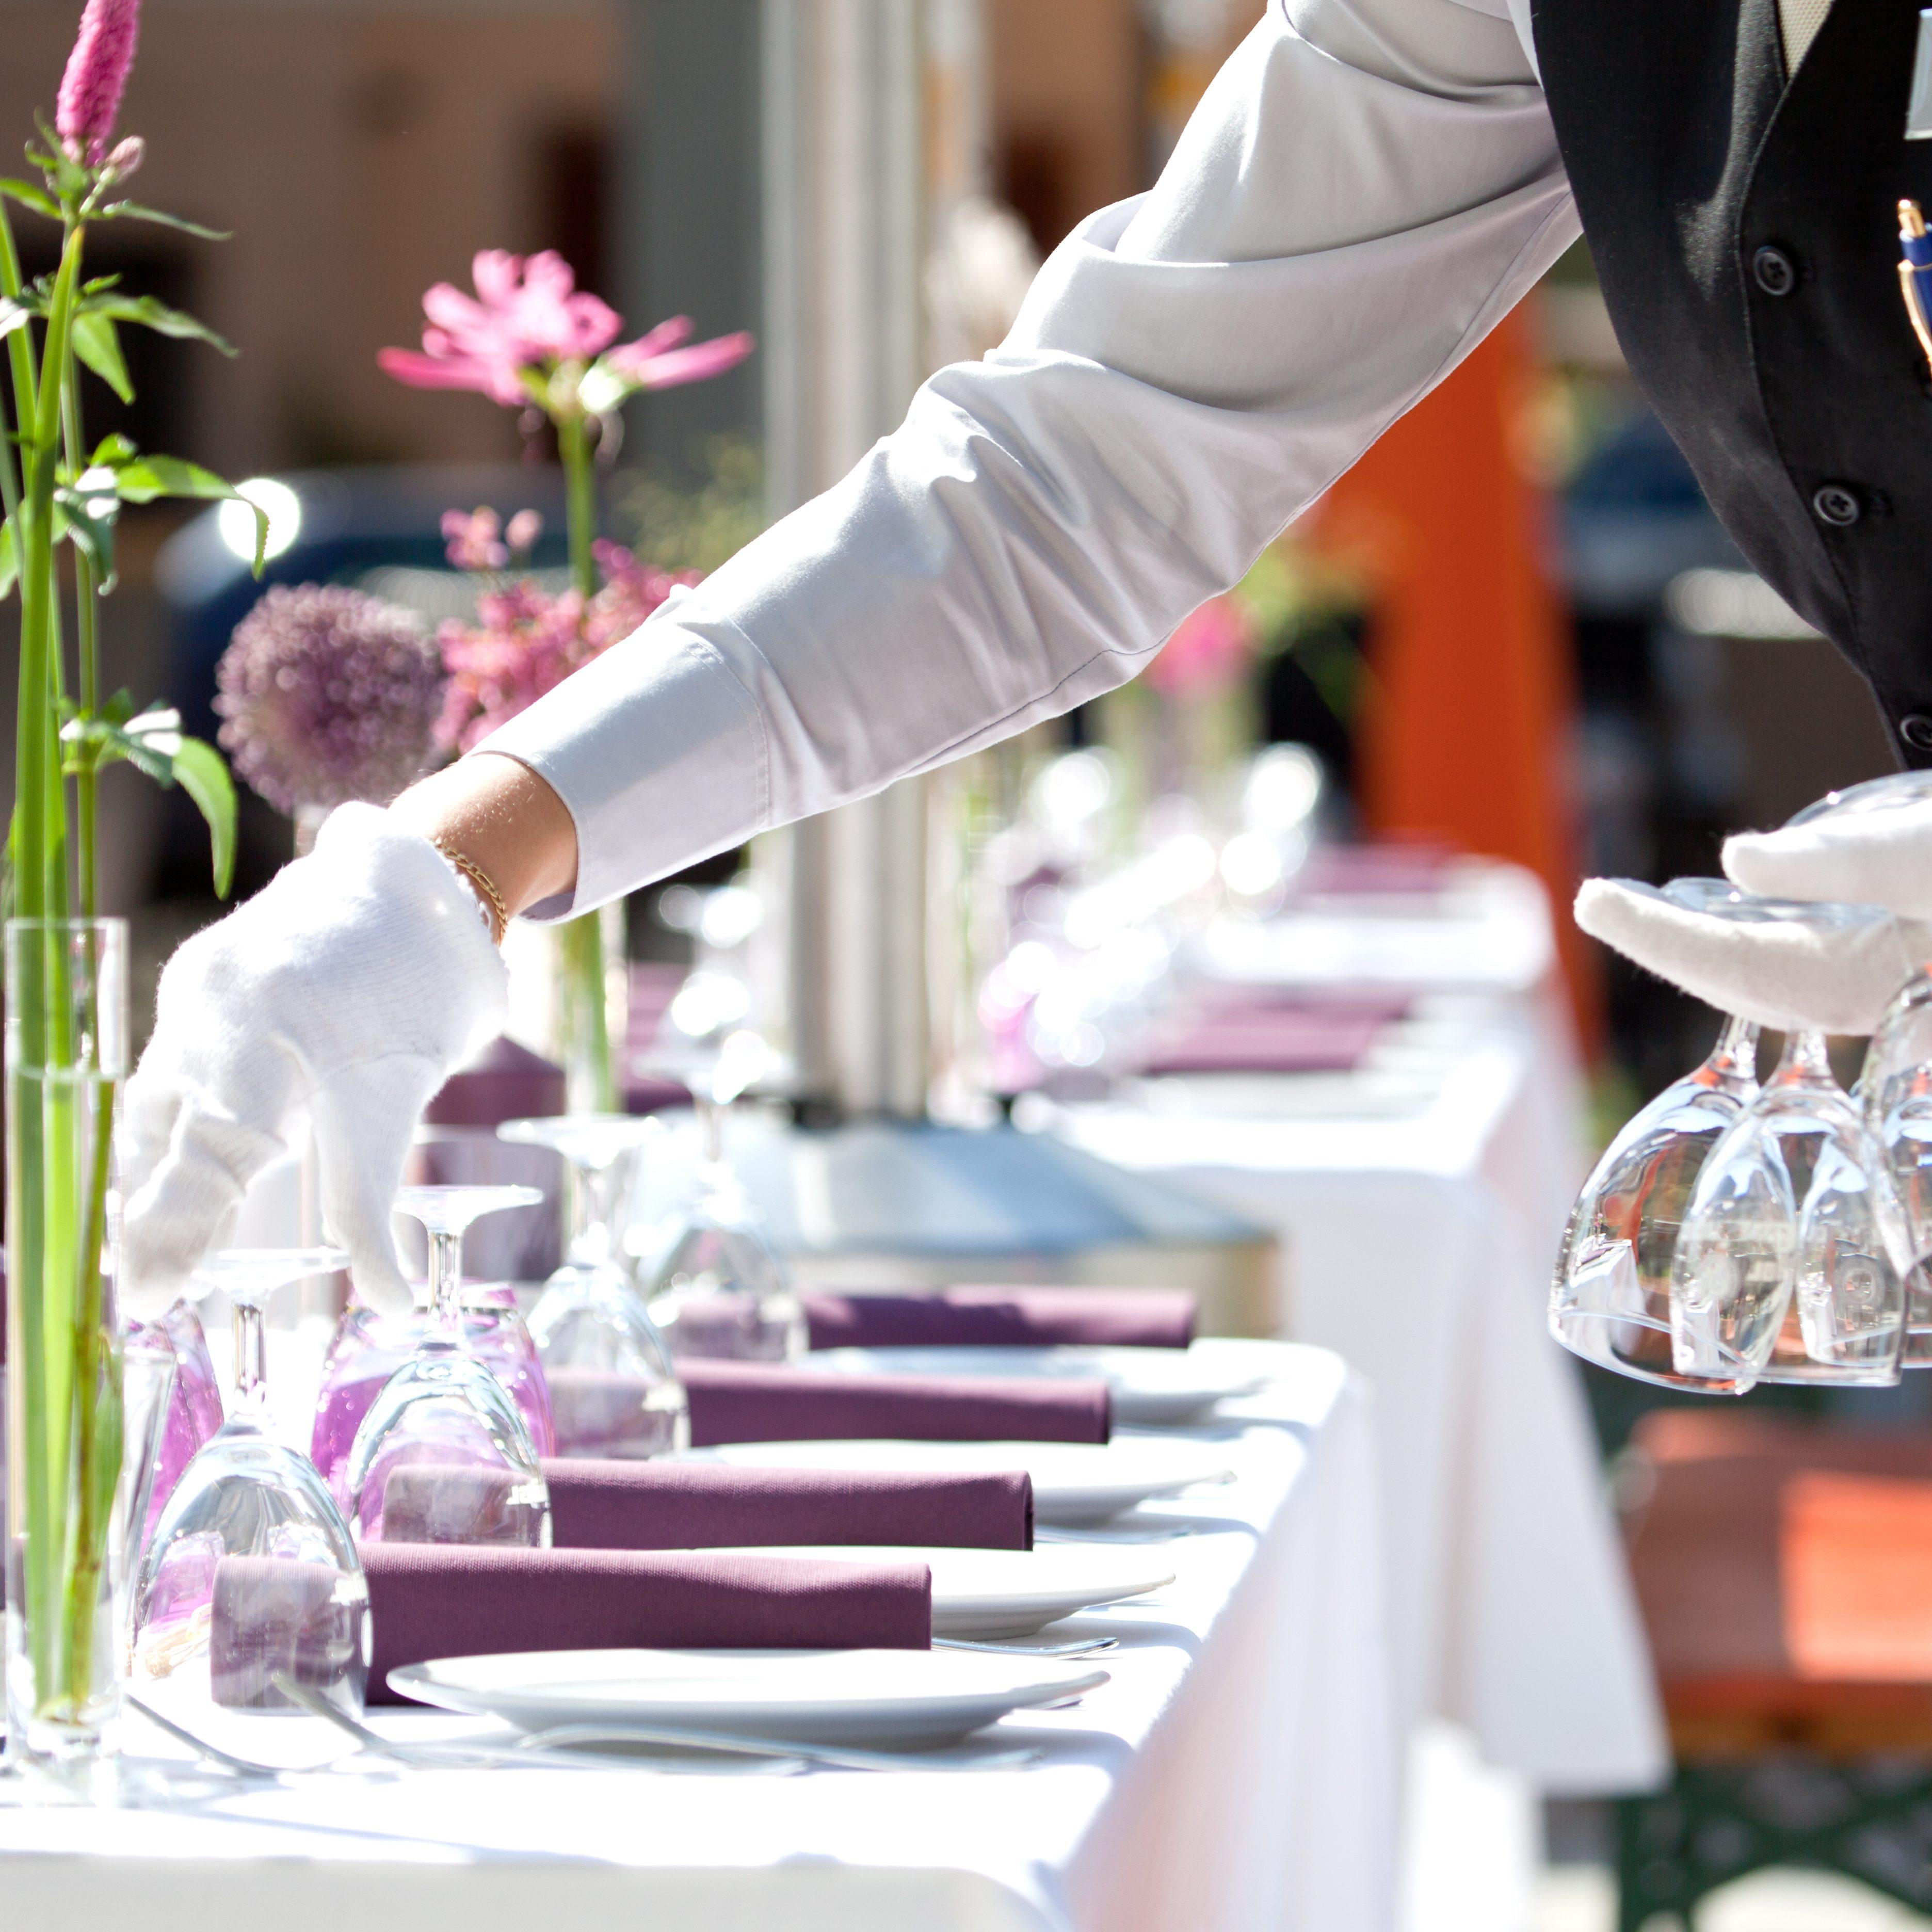 Veranstaltung Service